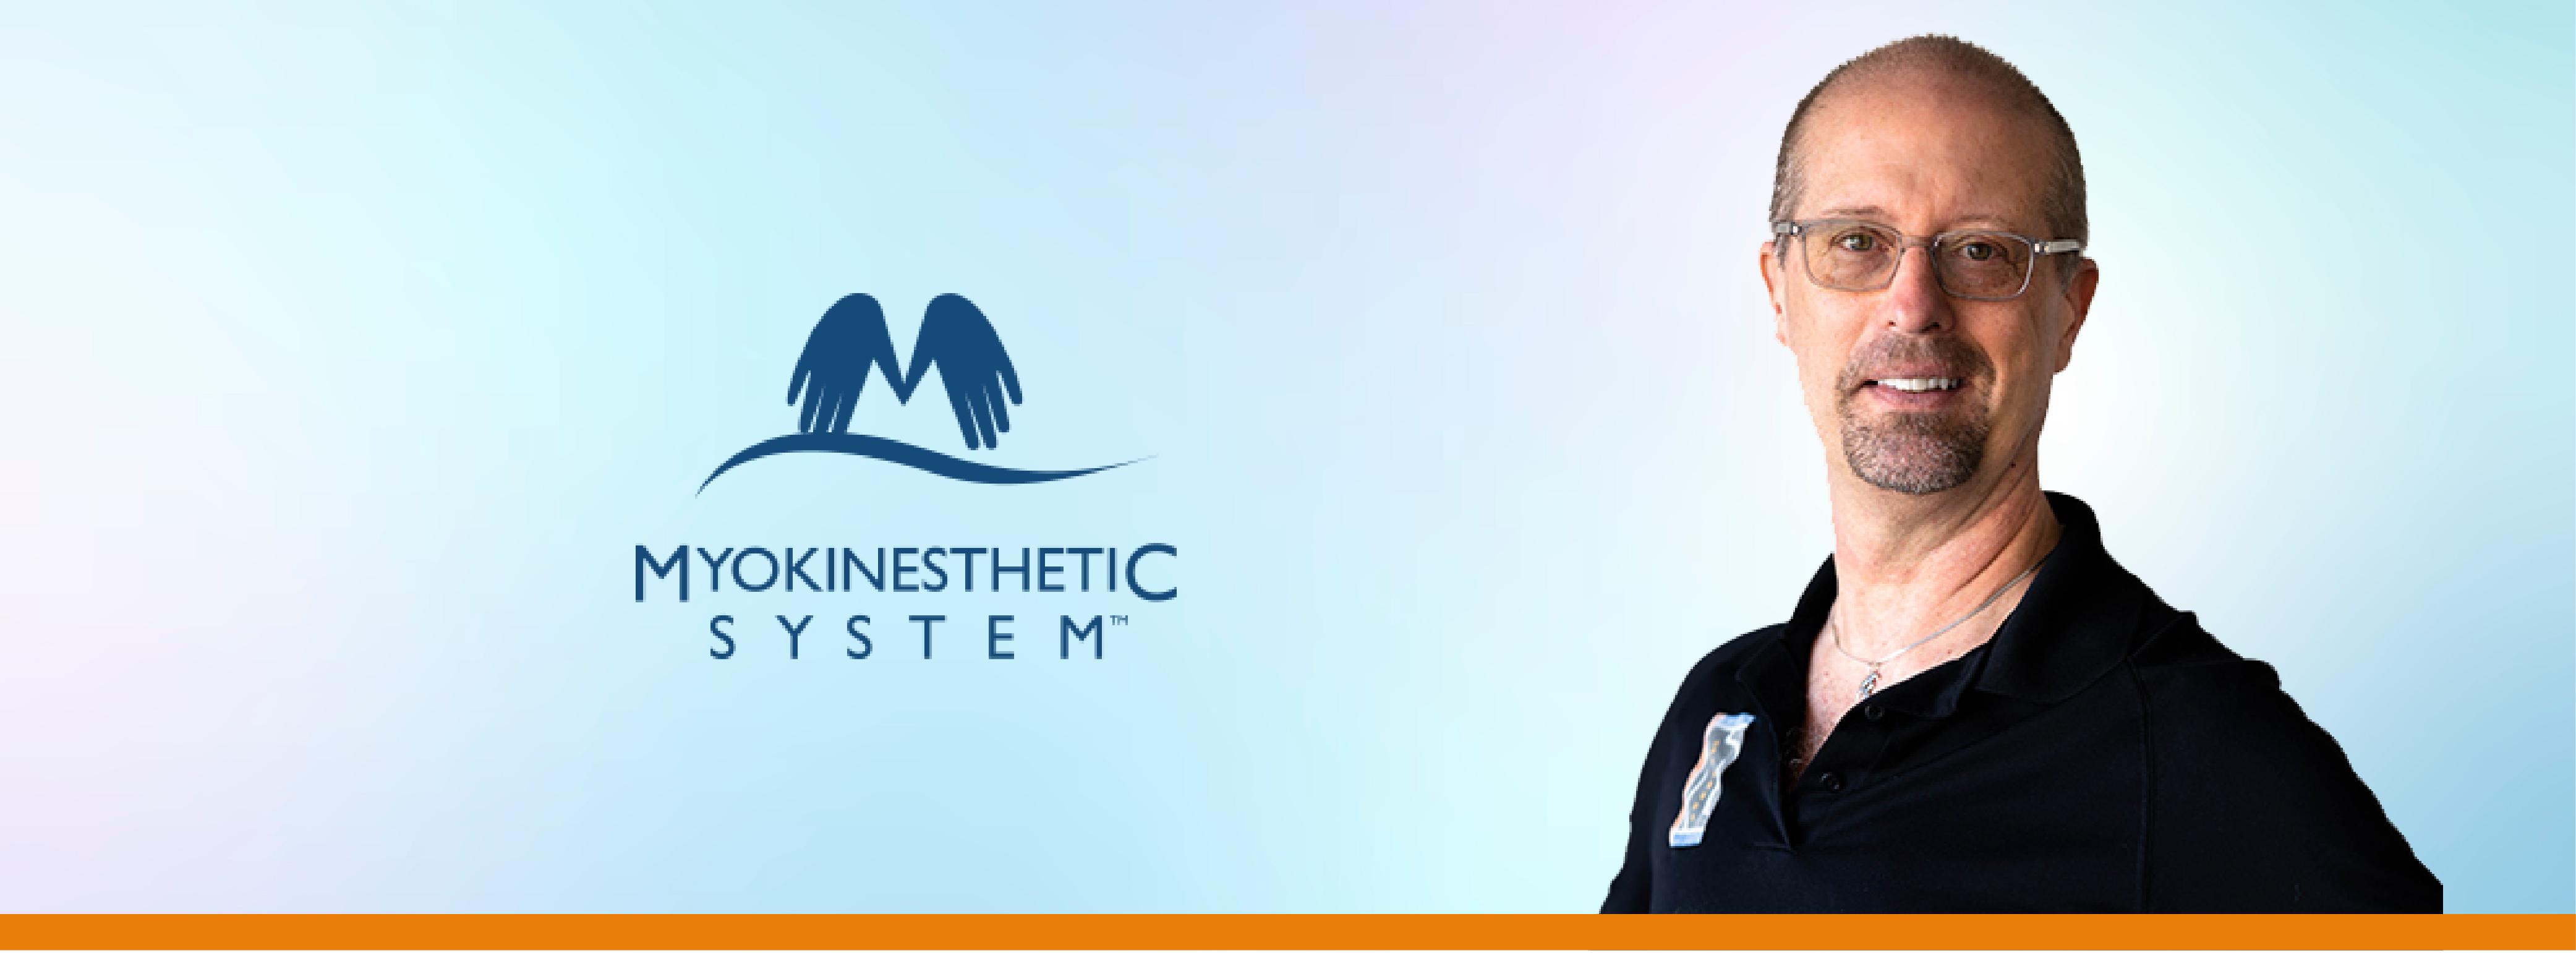 Myokinesthetic Treatment